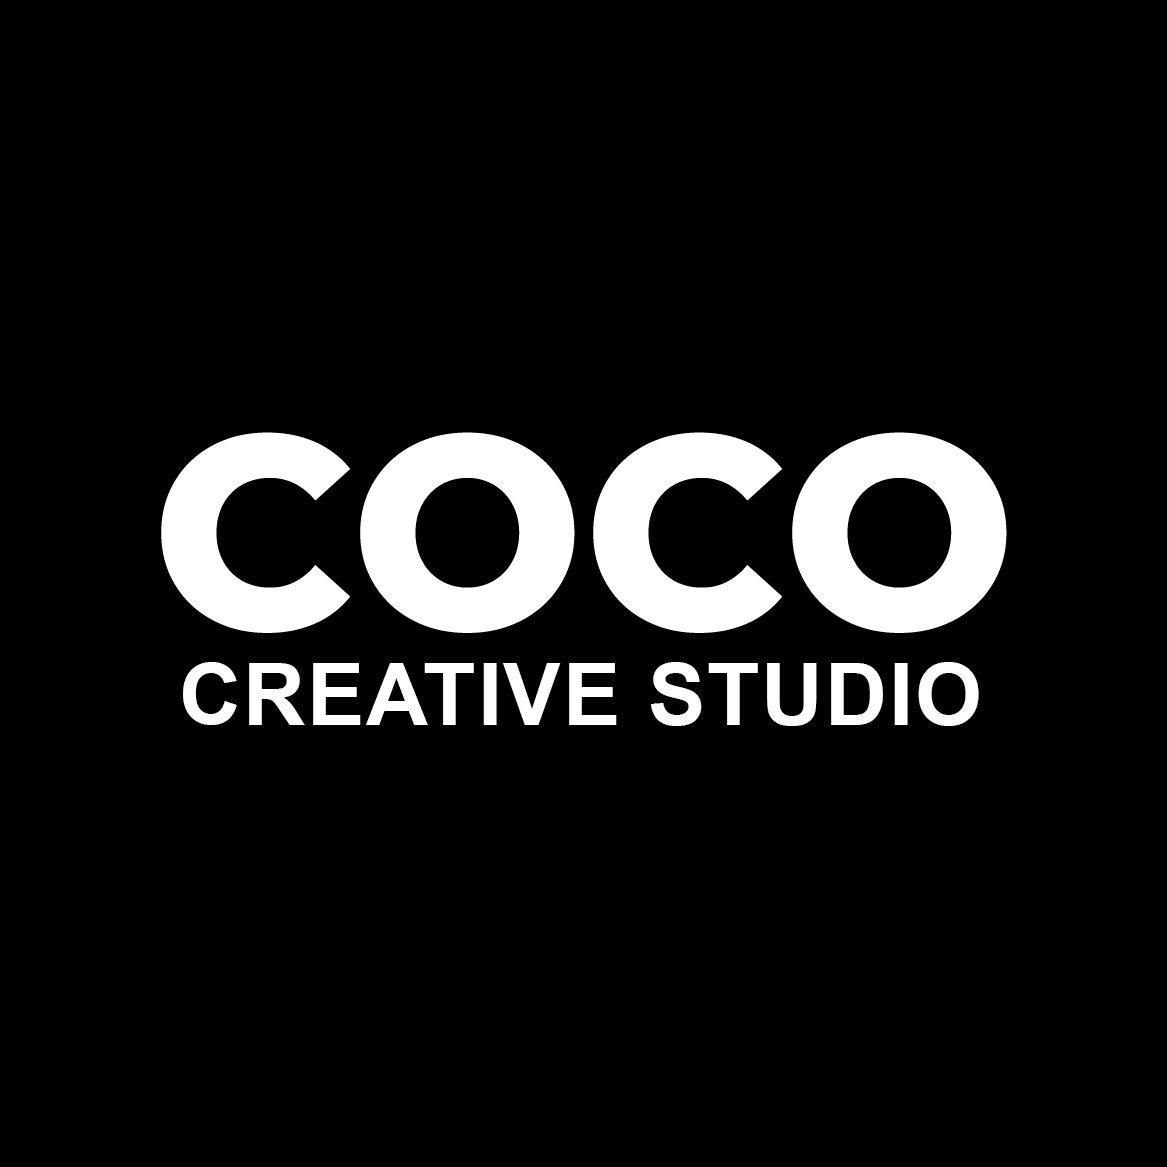 COCO CREATIVE STUDIO SINGAPORE PR COMMUNICATION